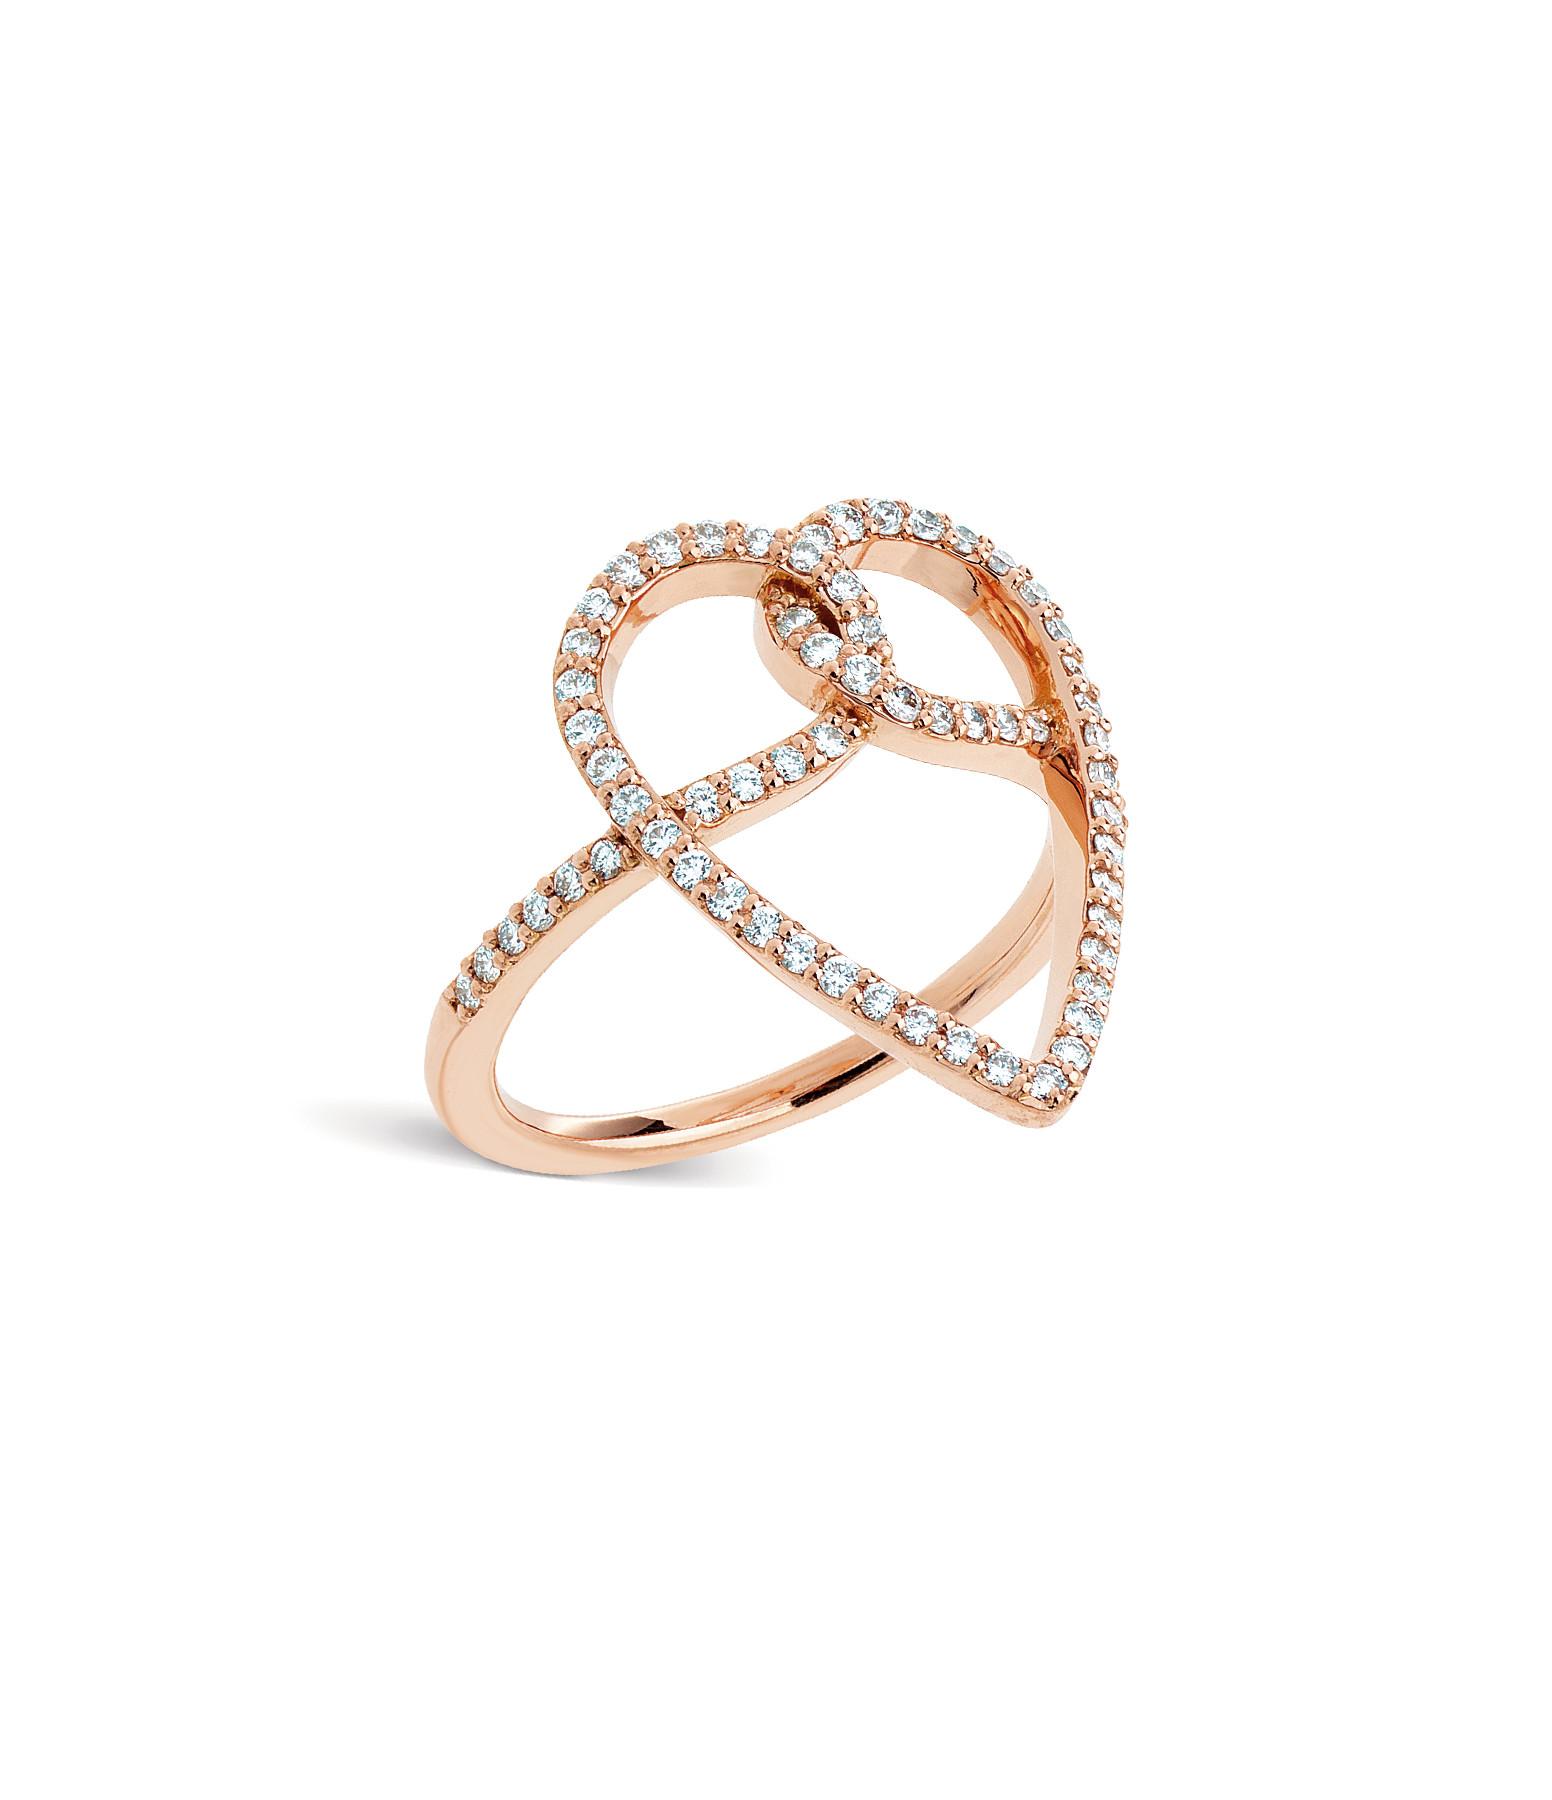 NAVA JOAILLERIE - Bague Joli CÂœur Diamants Or Rose